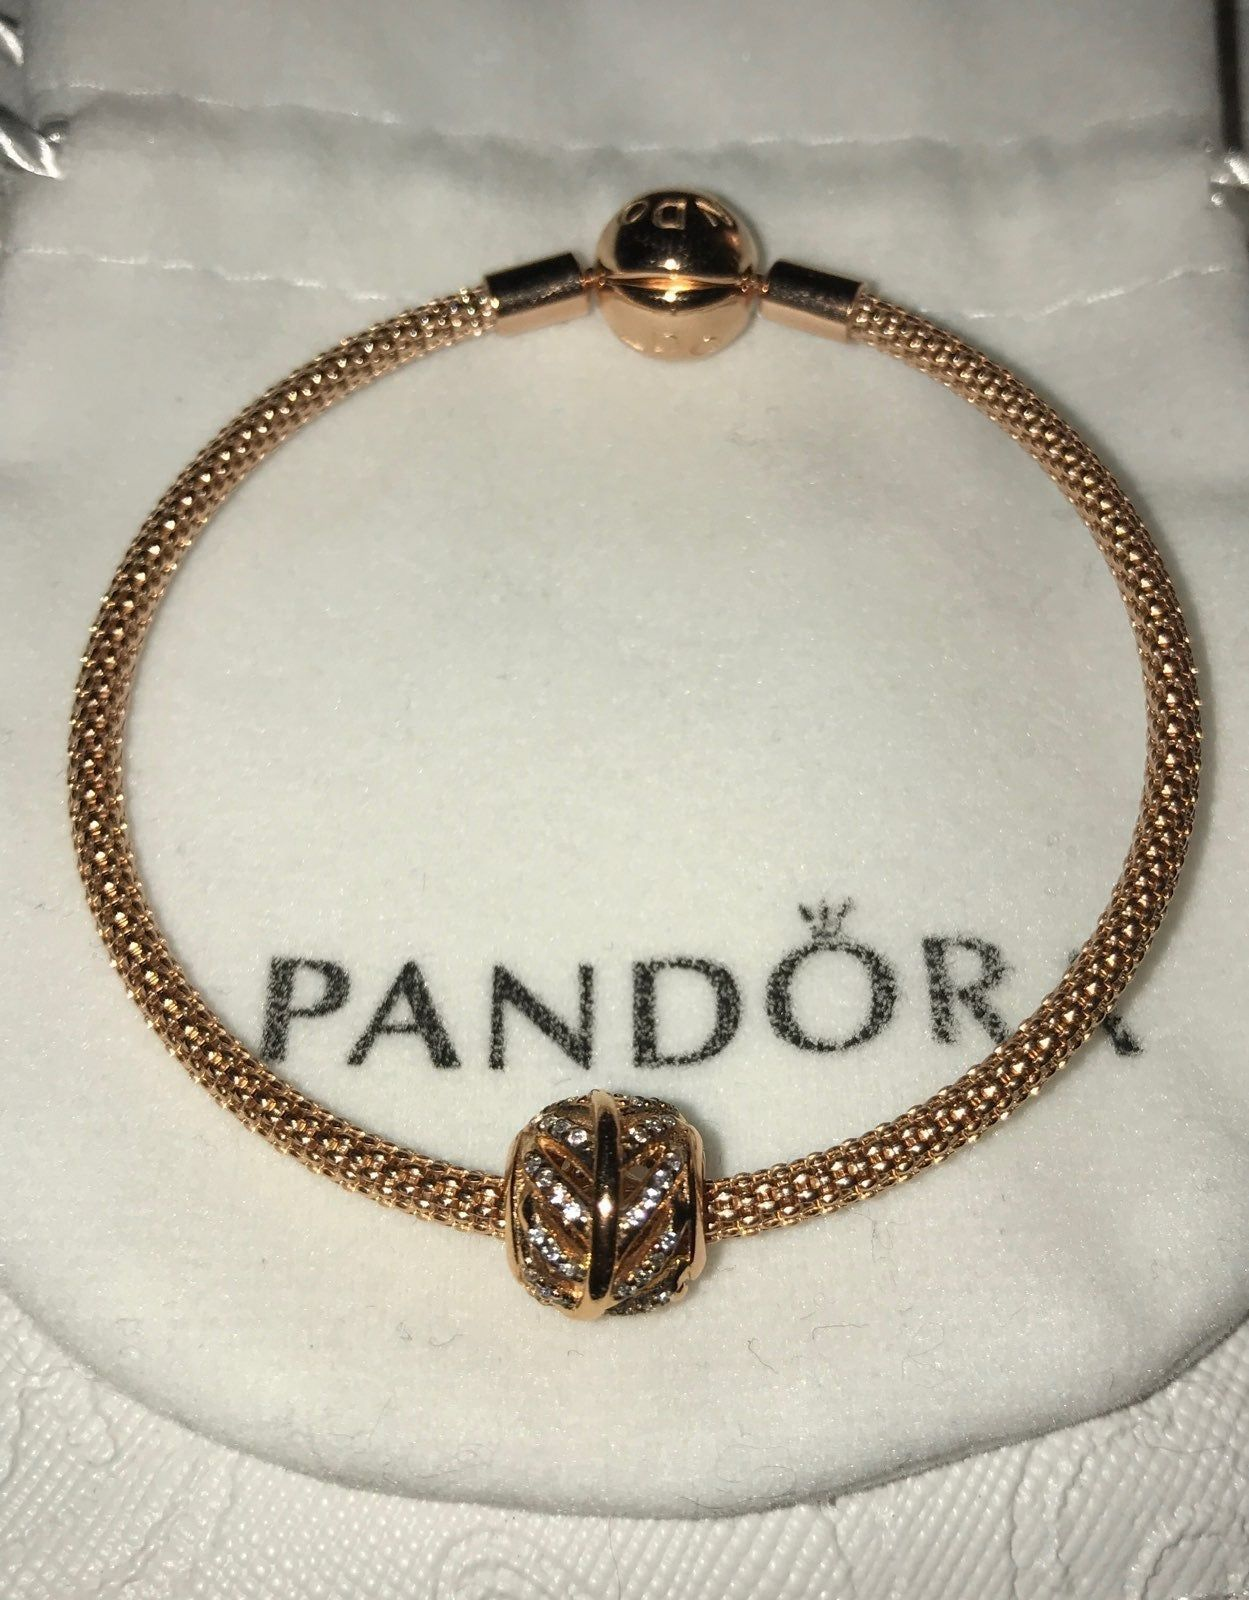 Pandora Moments Mesh Bracelet w/Charm Rose Gold Size 6.7 New ...